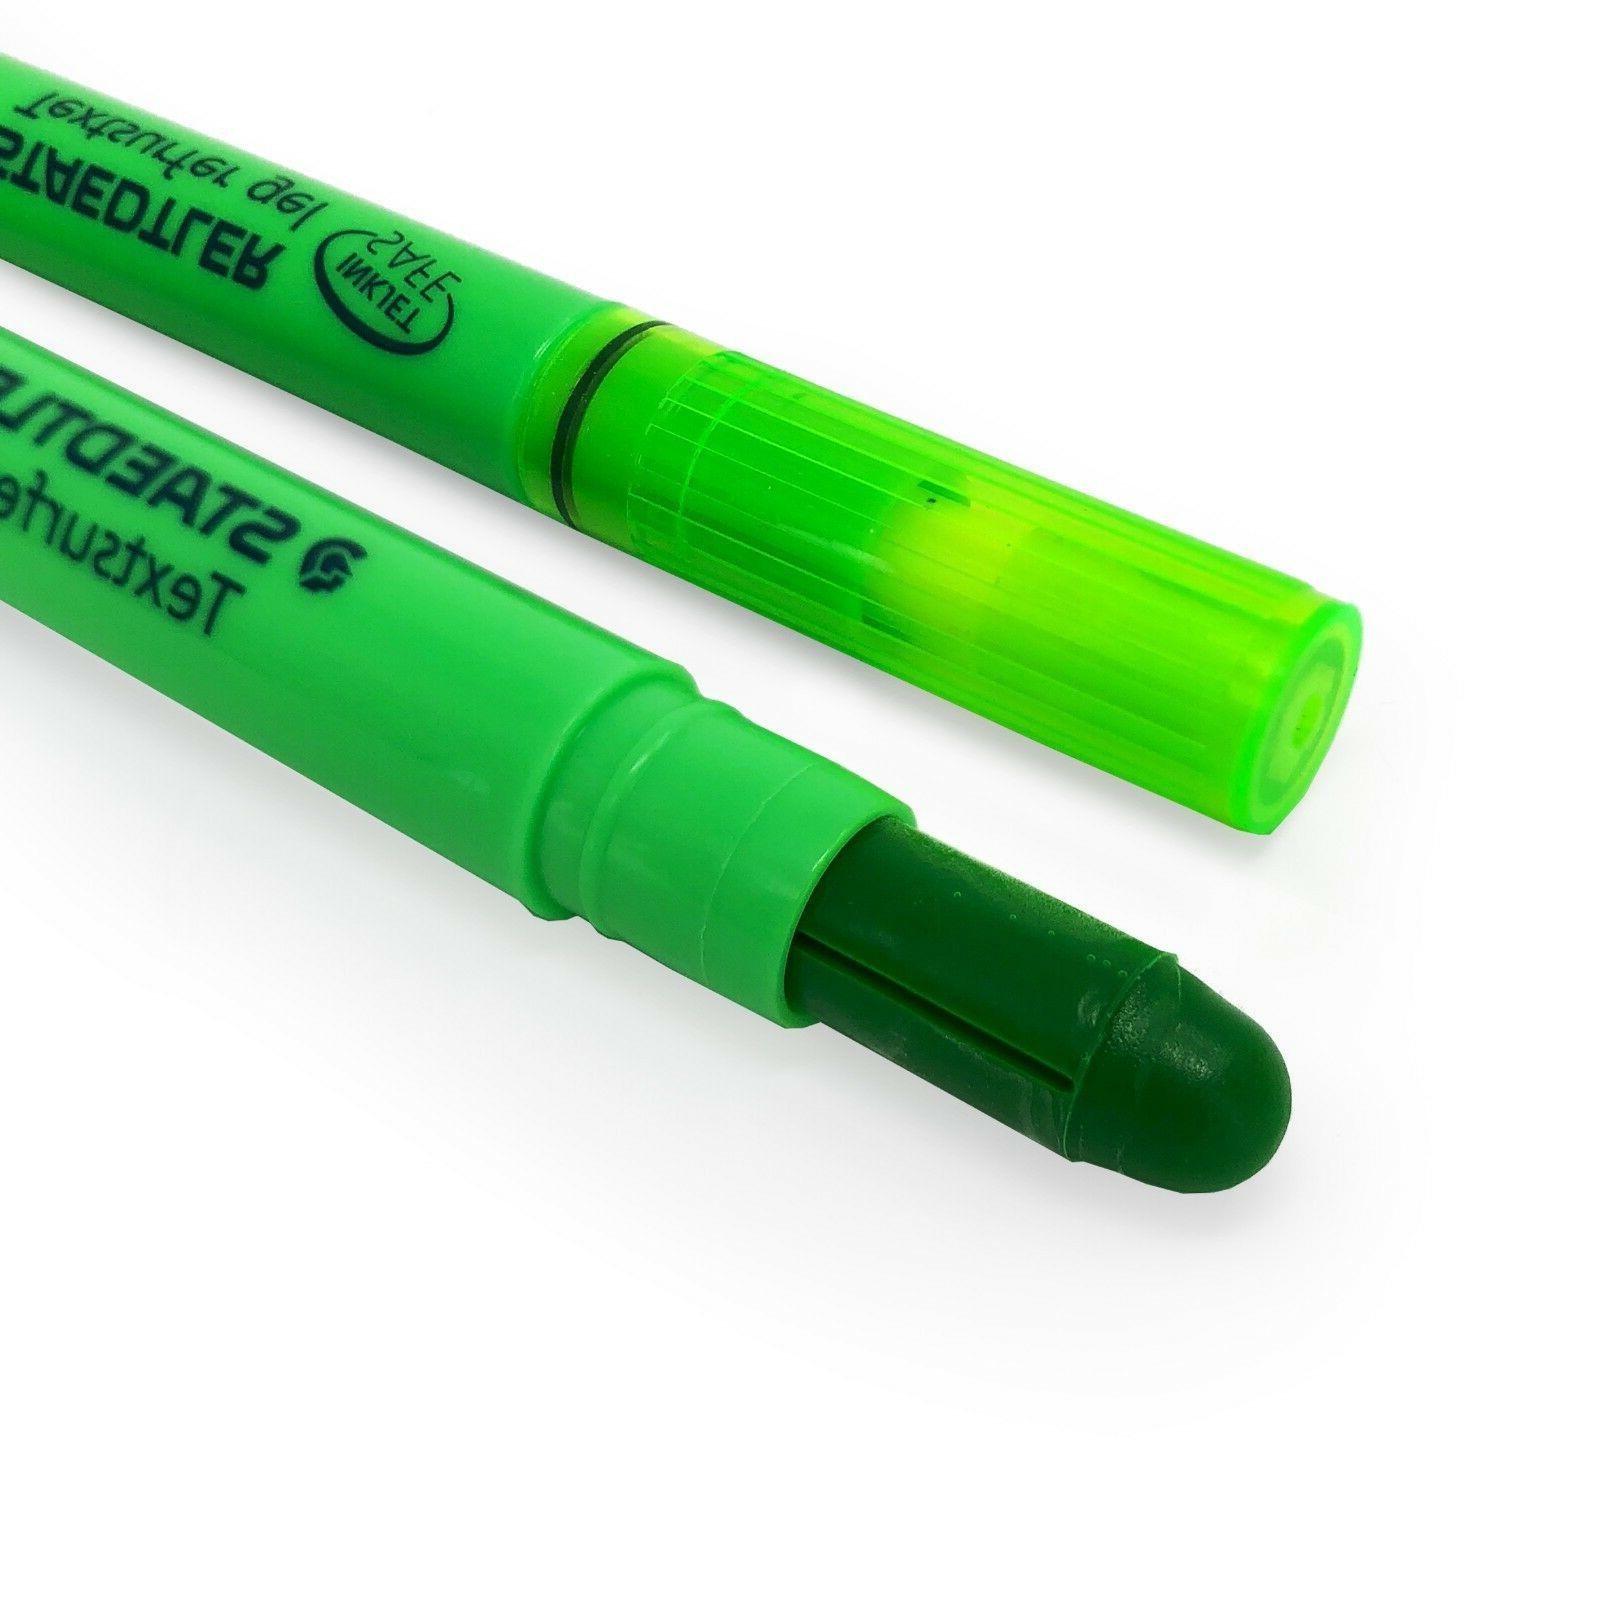 Staedtler Gel Pen - - Pack 1 of